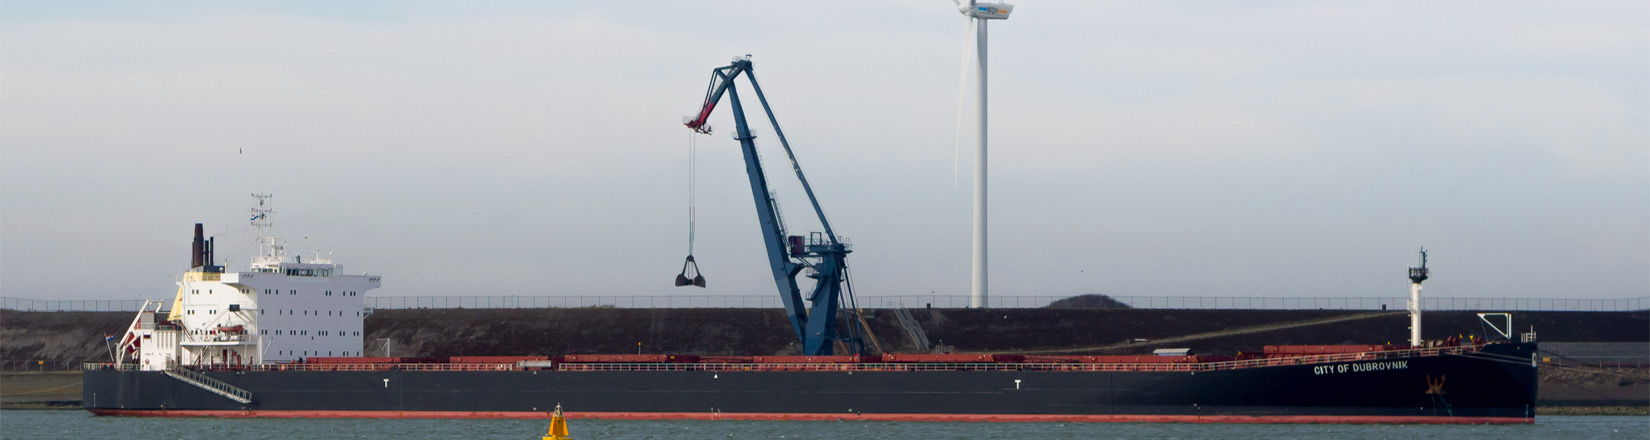 Erasmus crane IJmuiden